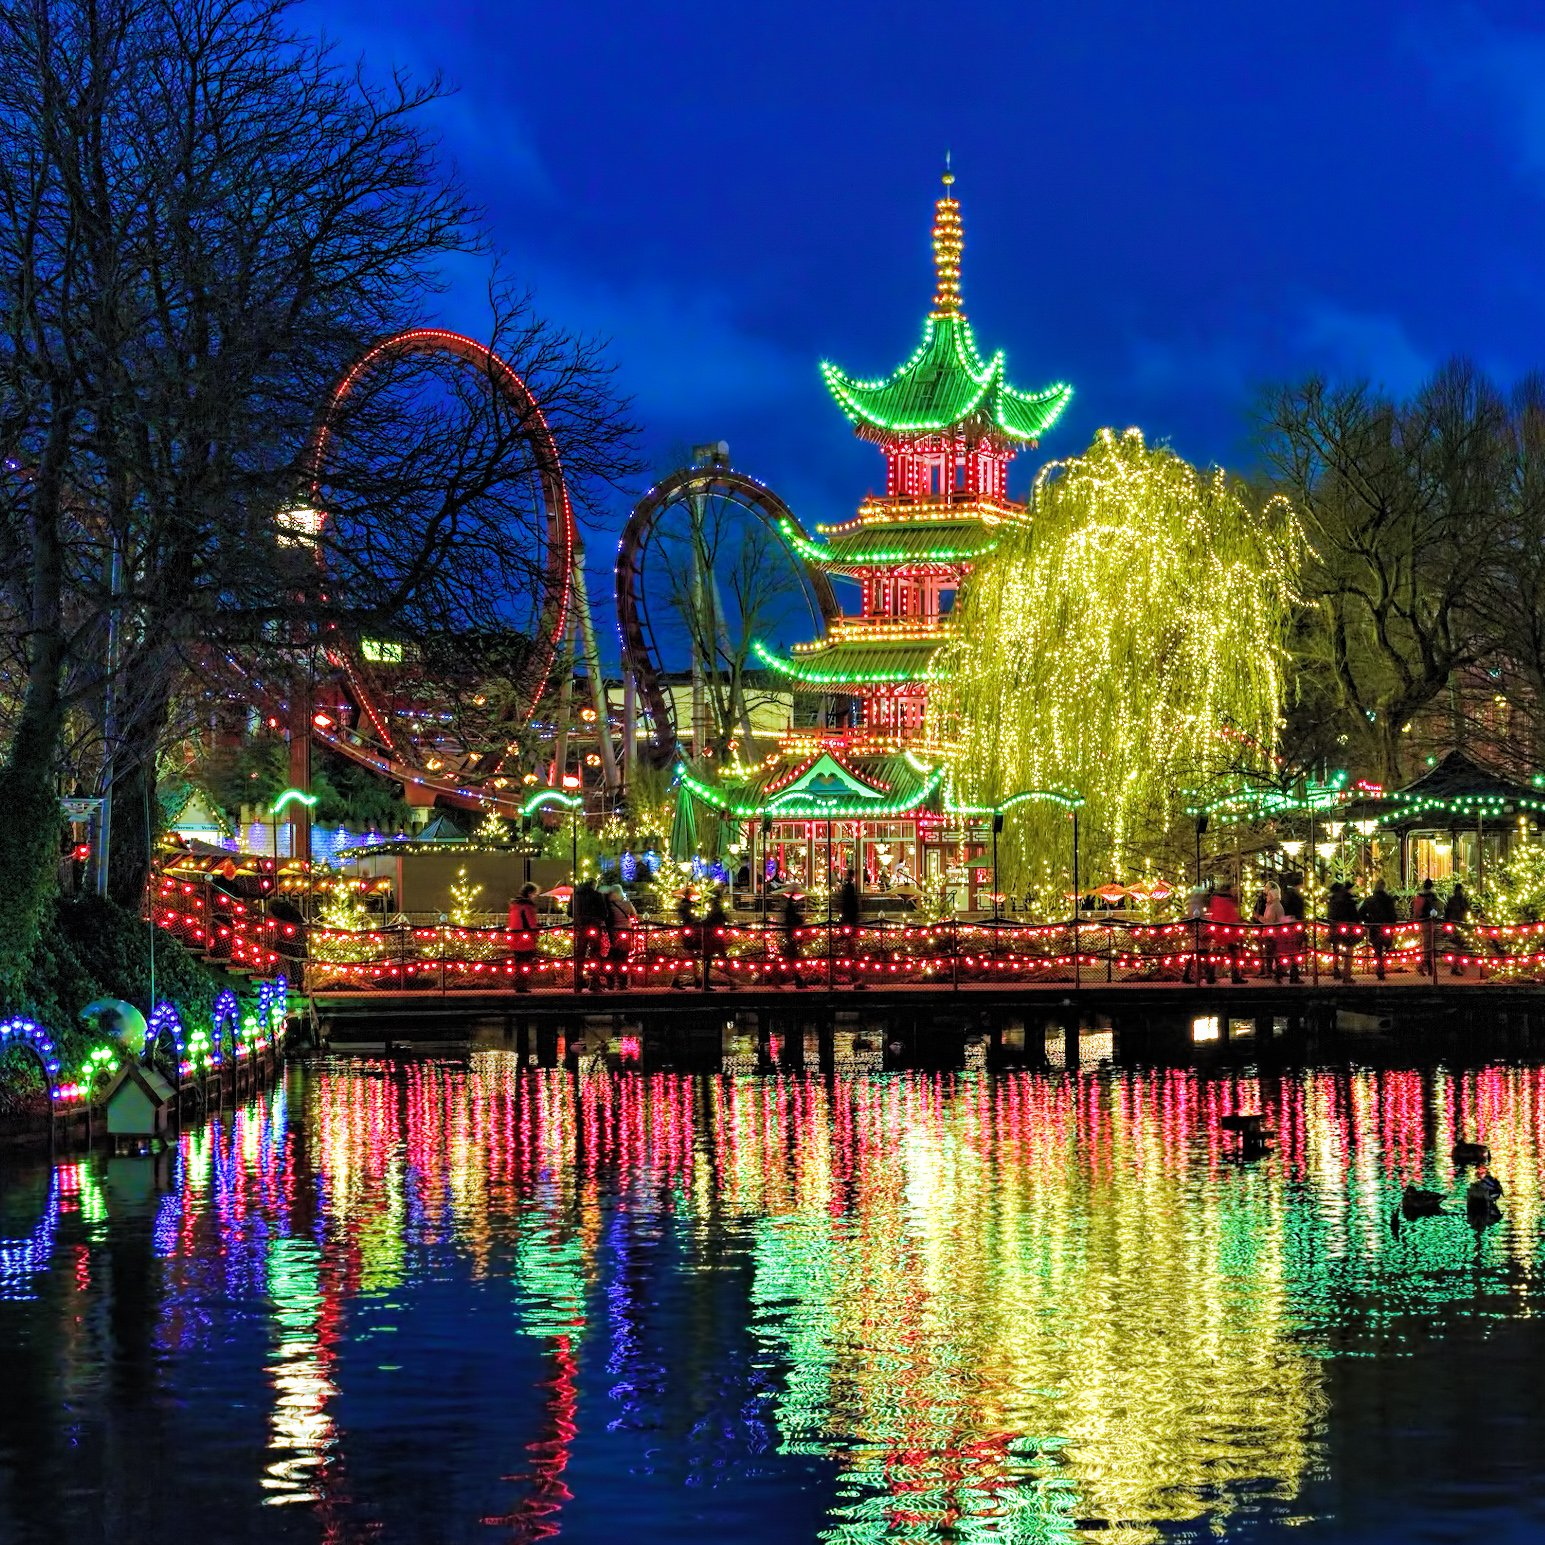 Tivoli Gardens Copenhagen Christmas Market 2021 Why Tivoli Gardens Is A Must Visit Around Christmas